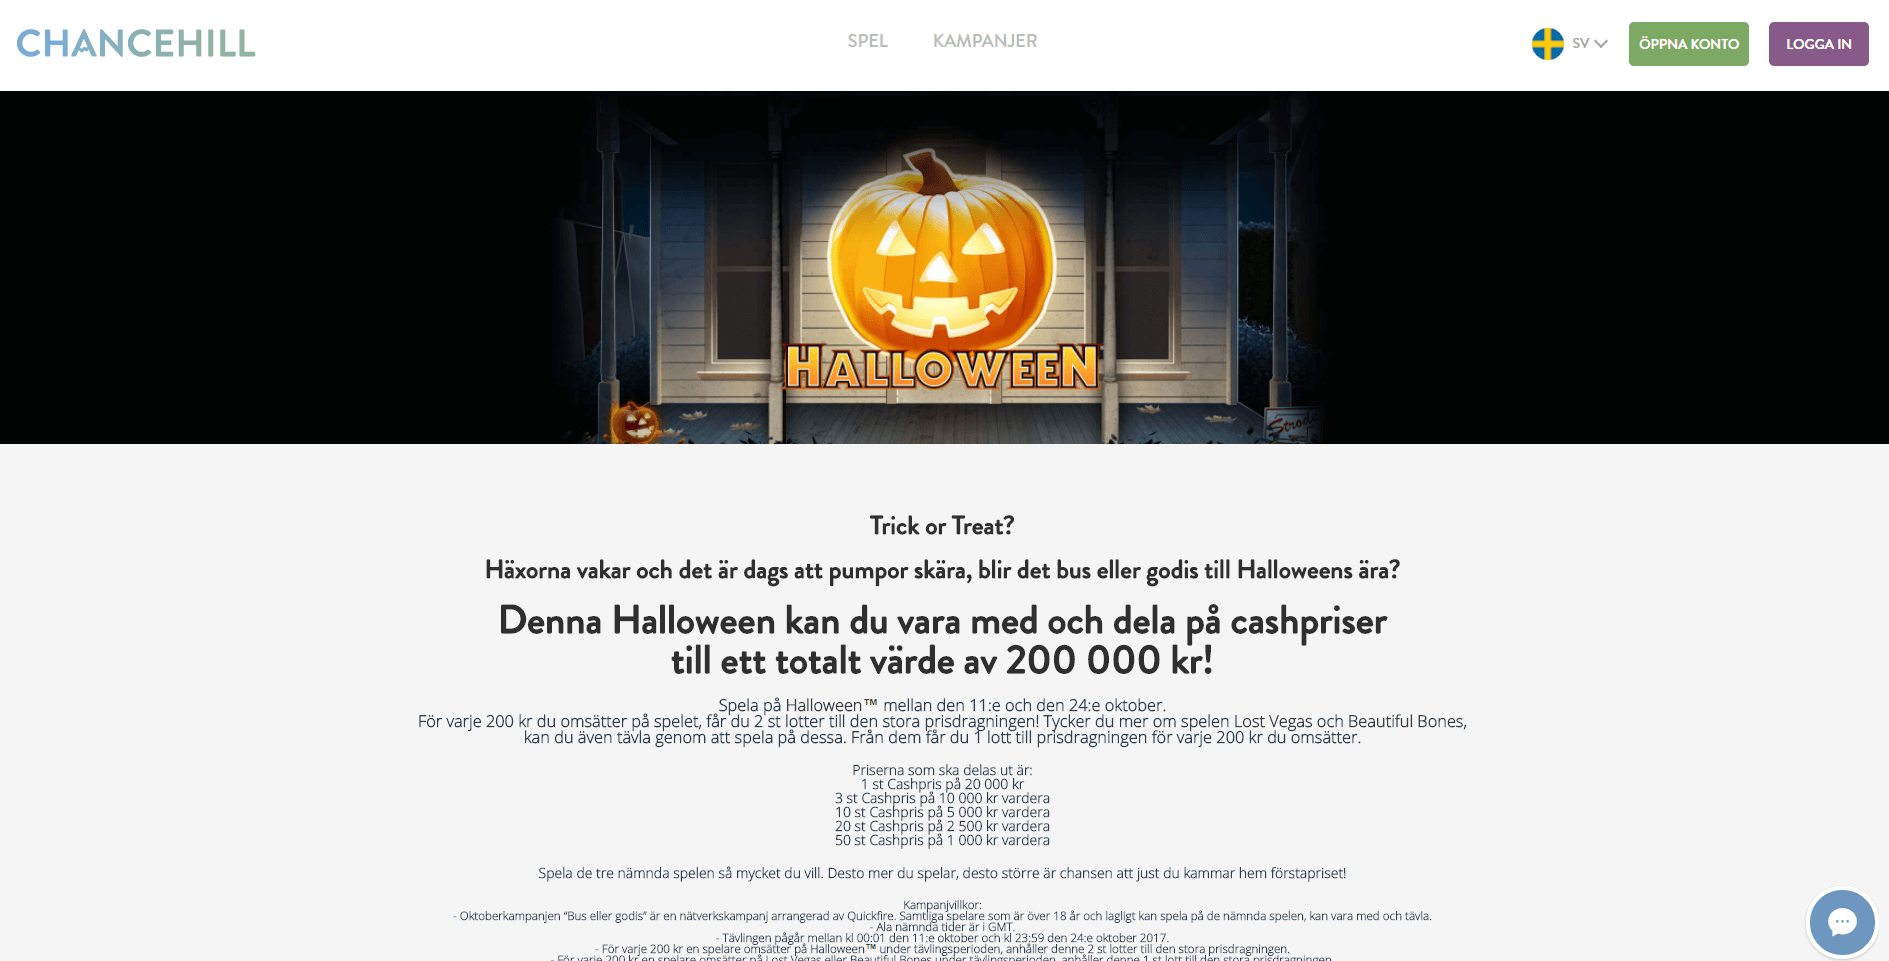 Halloween kampanj Chancehill